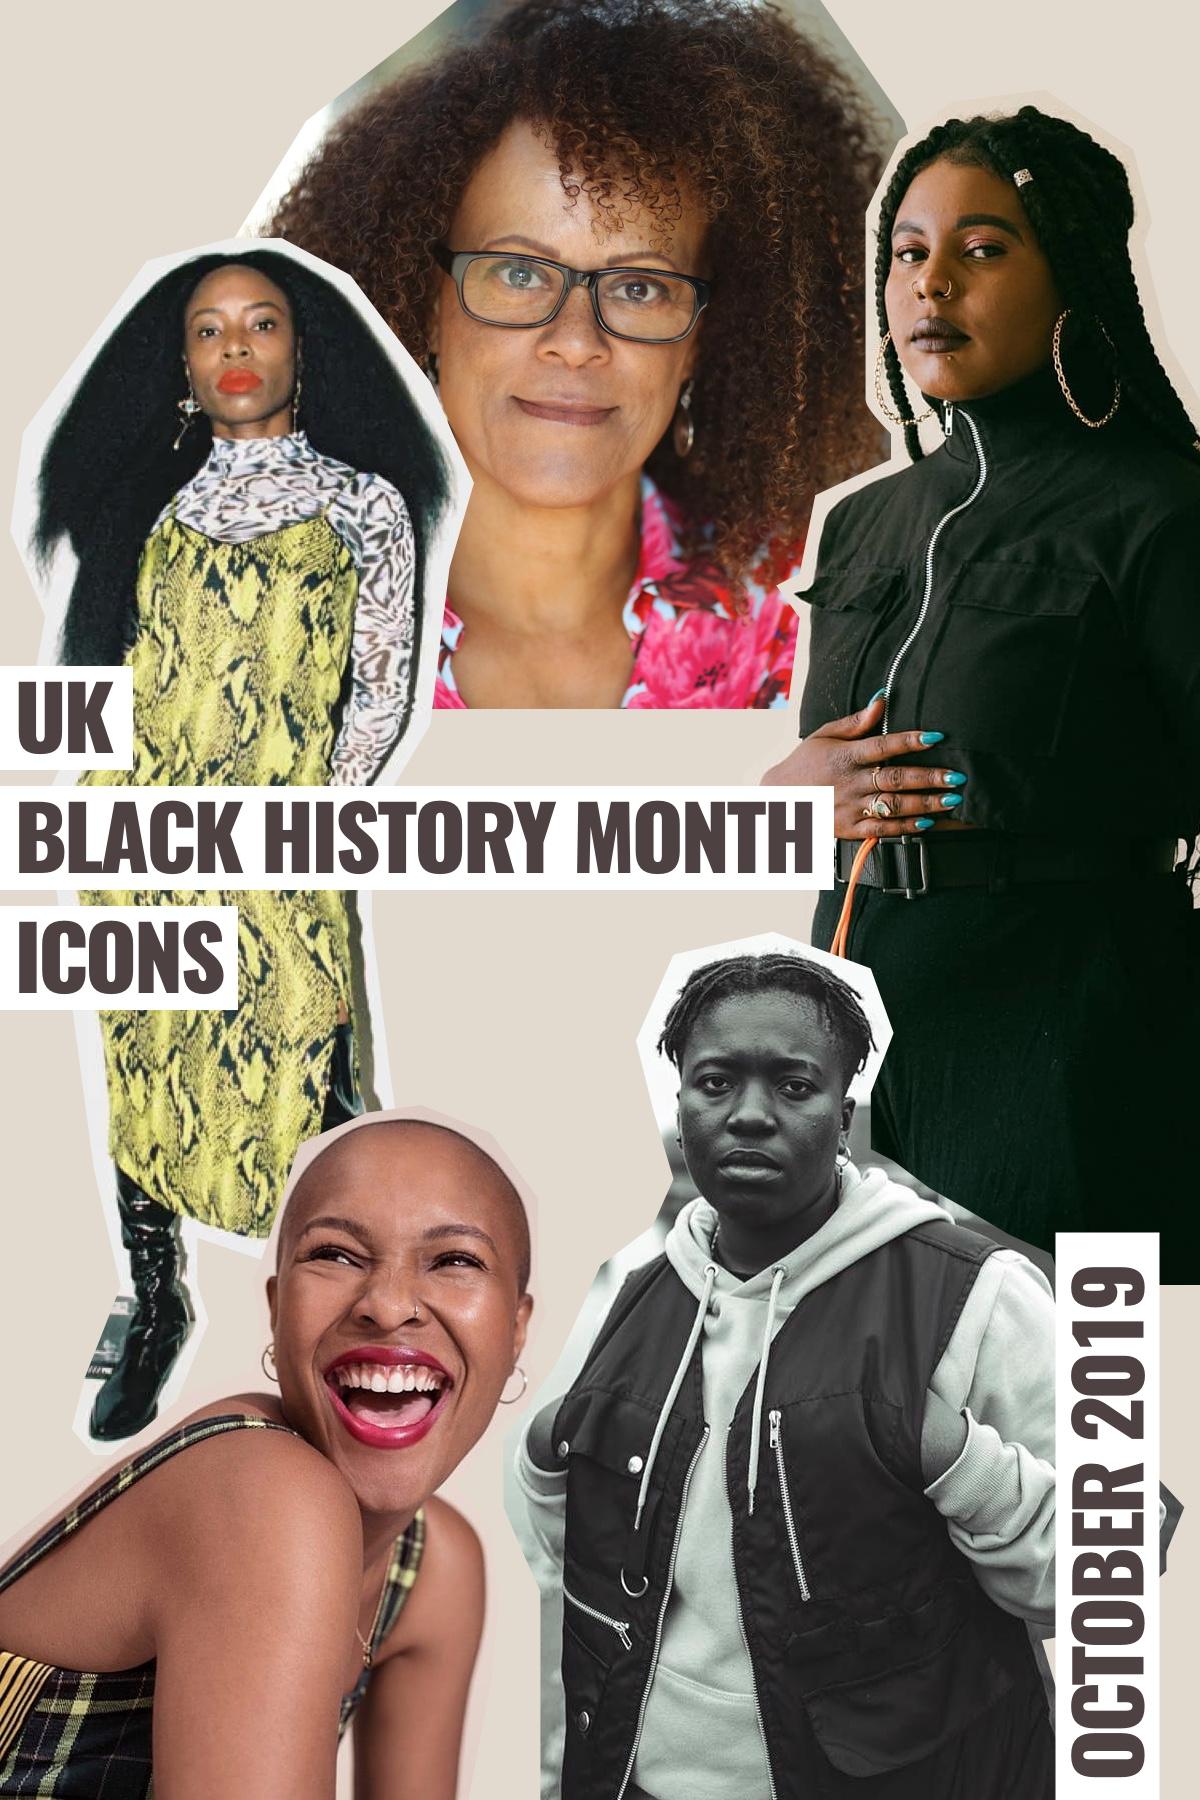 YEOJA Mag - UK Black History Month - UK Black History Month Icons 2019 - Written by Candice Nembhard , Artwork by Rae Tilly